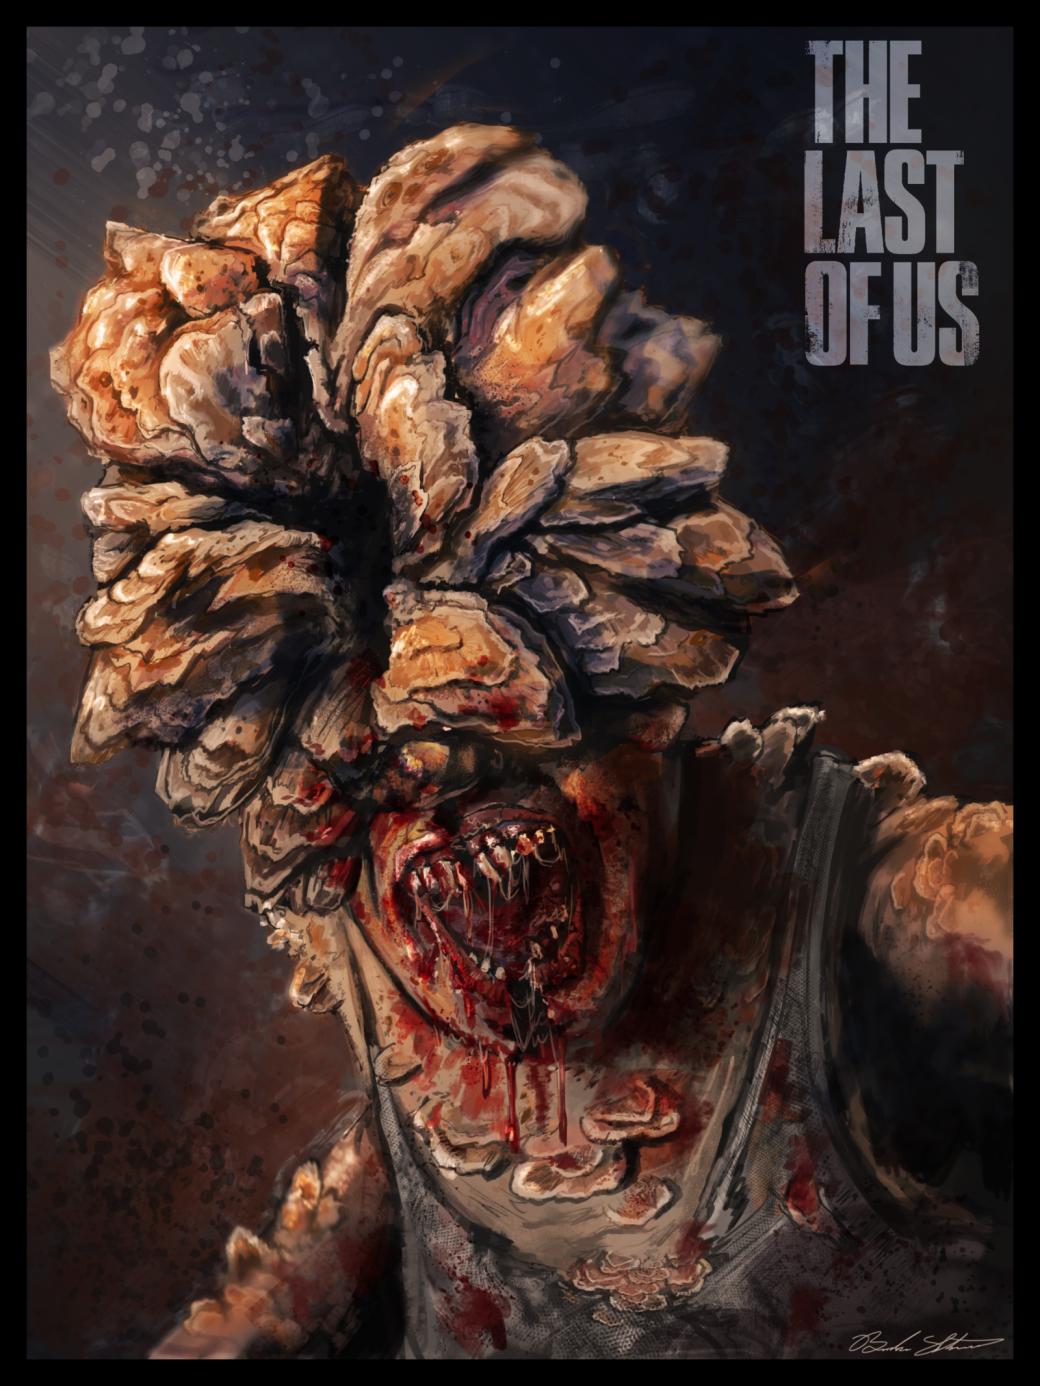 The Last of Us: живая классика или пустышка? - Изображение 10